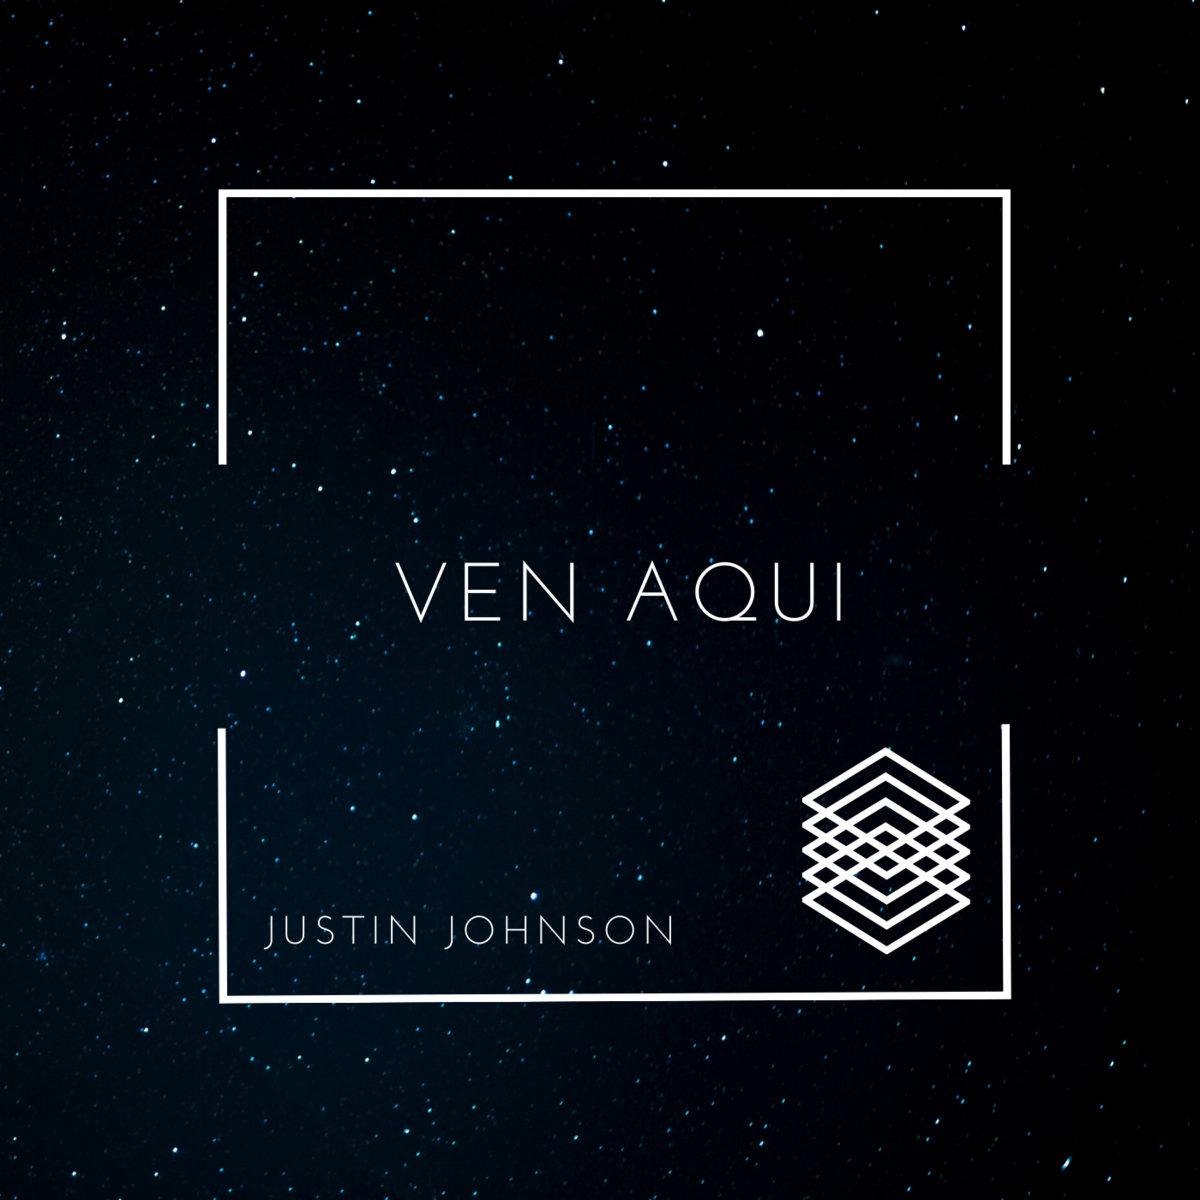 Ven Aqui Justin Johnson Justin Johnson